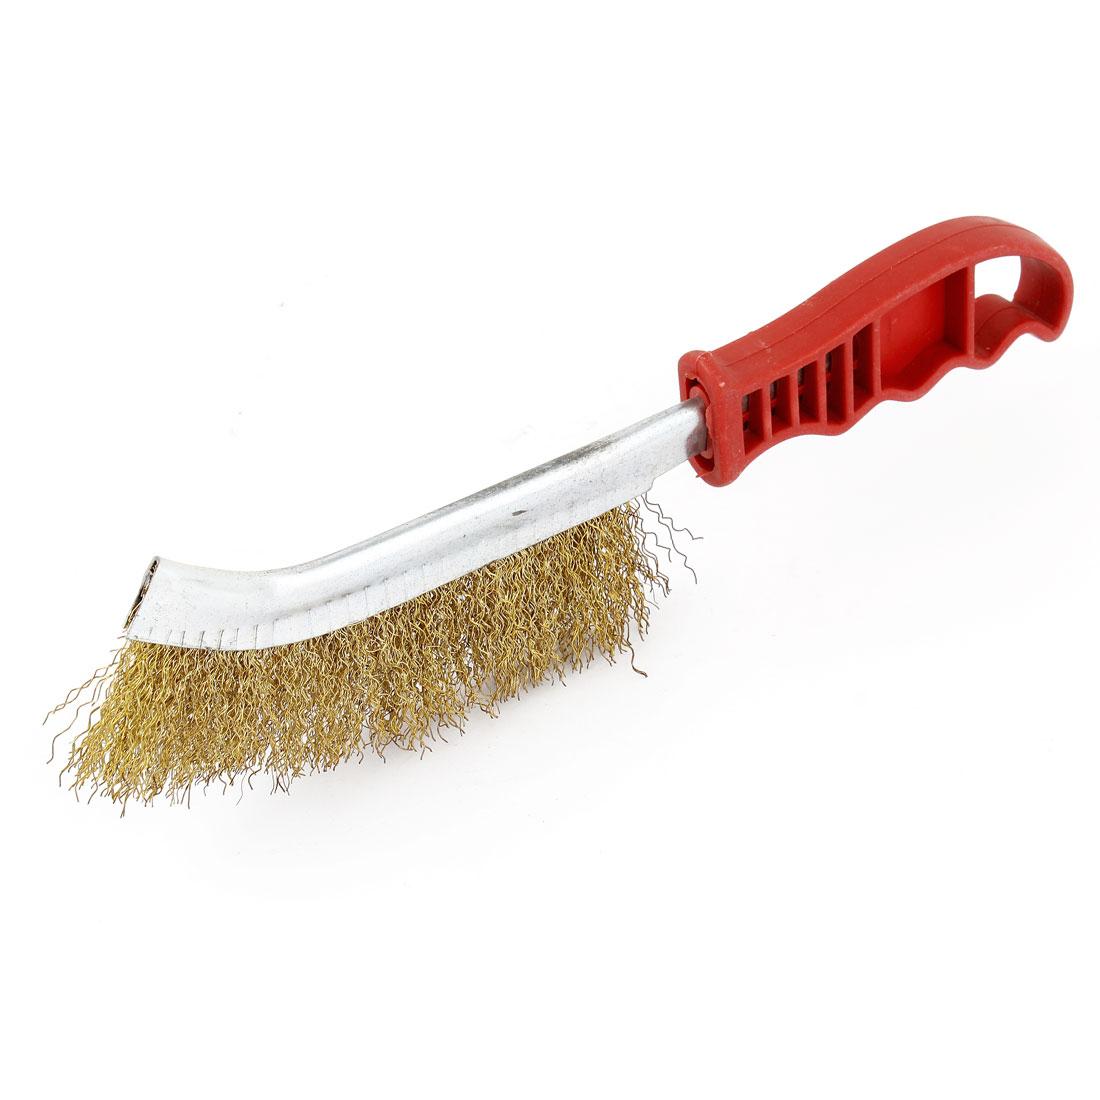 Nonslip-Handle-Grinding-Polishing-Crimped-Brass-Wire-Brush-25cm-Length